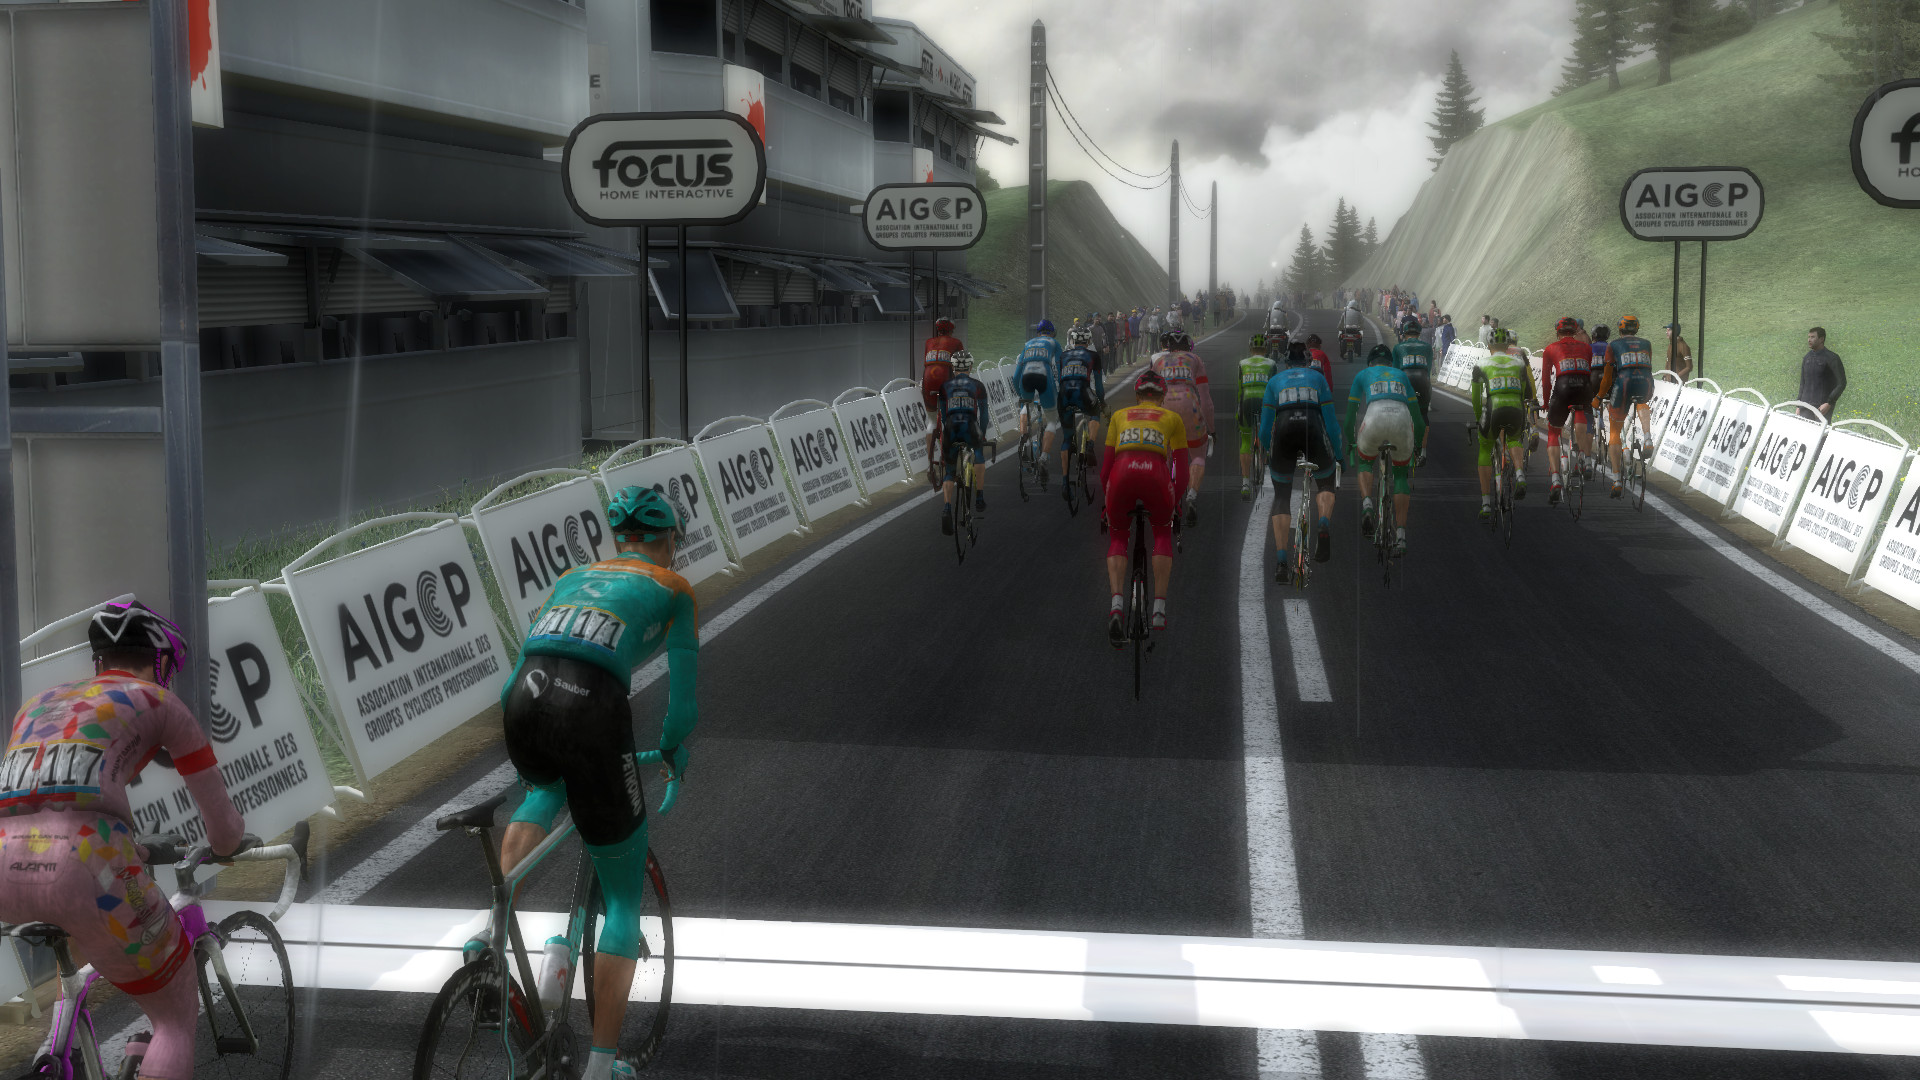 pcmdaily.com/images/mg/2019/Races/PTHC/Pologne/E5/30.jpg